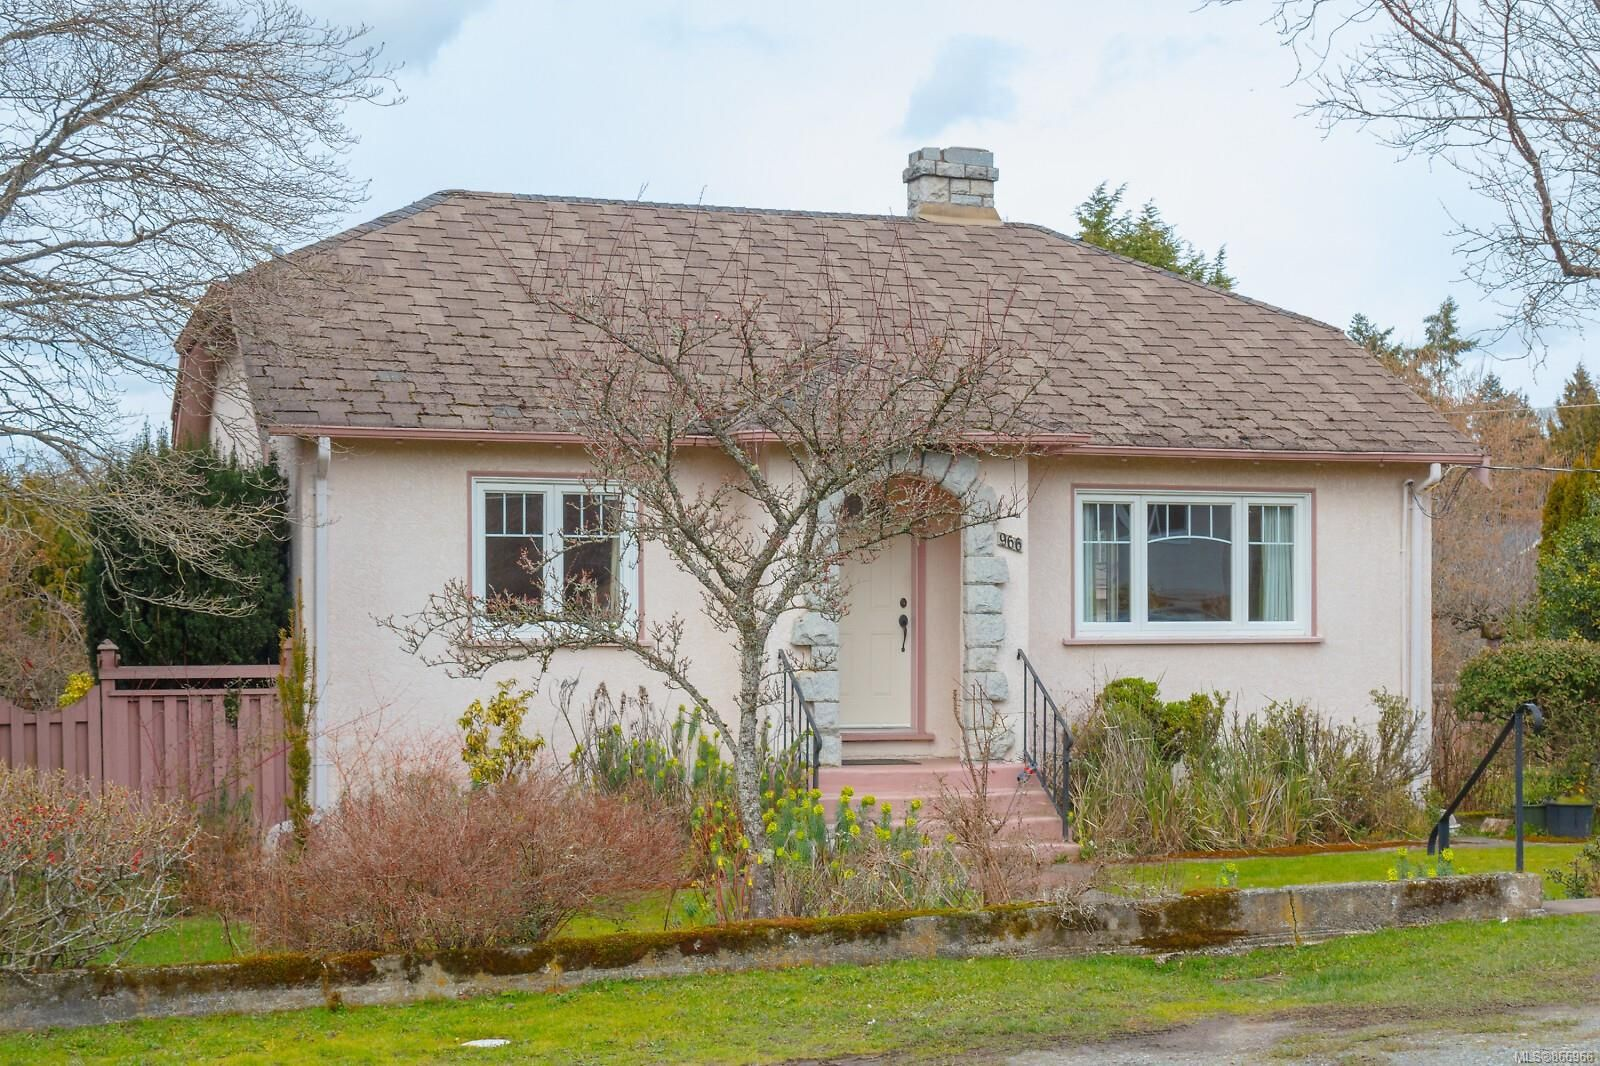 Main Photo: 966 Lovat Ave in : SE Quadra House for sale (Saanich East)  : MLS®# 866966